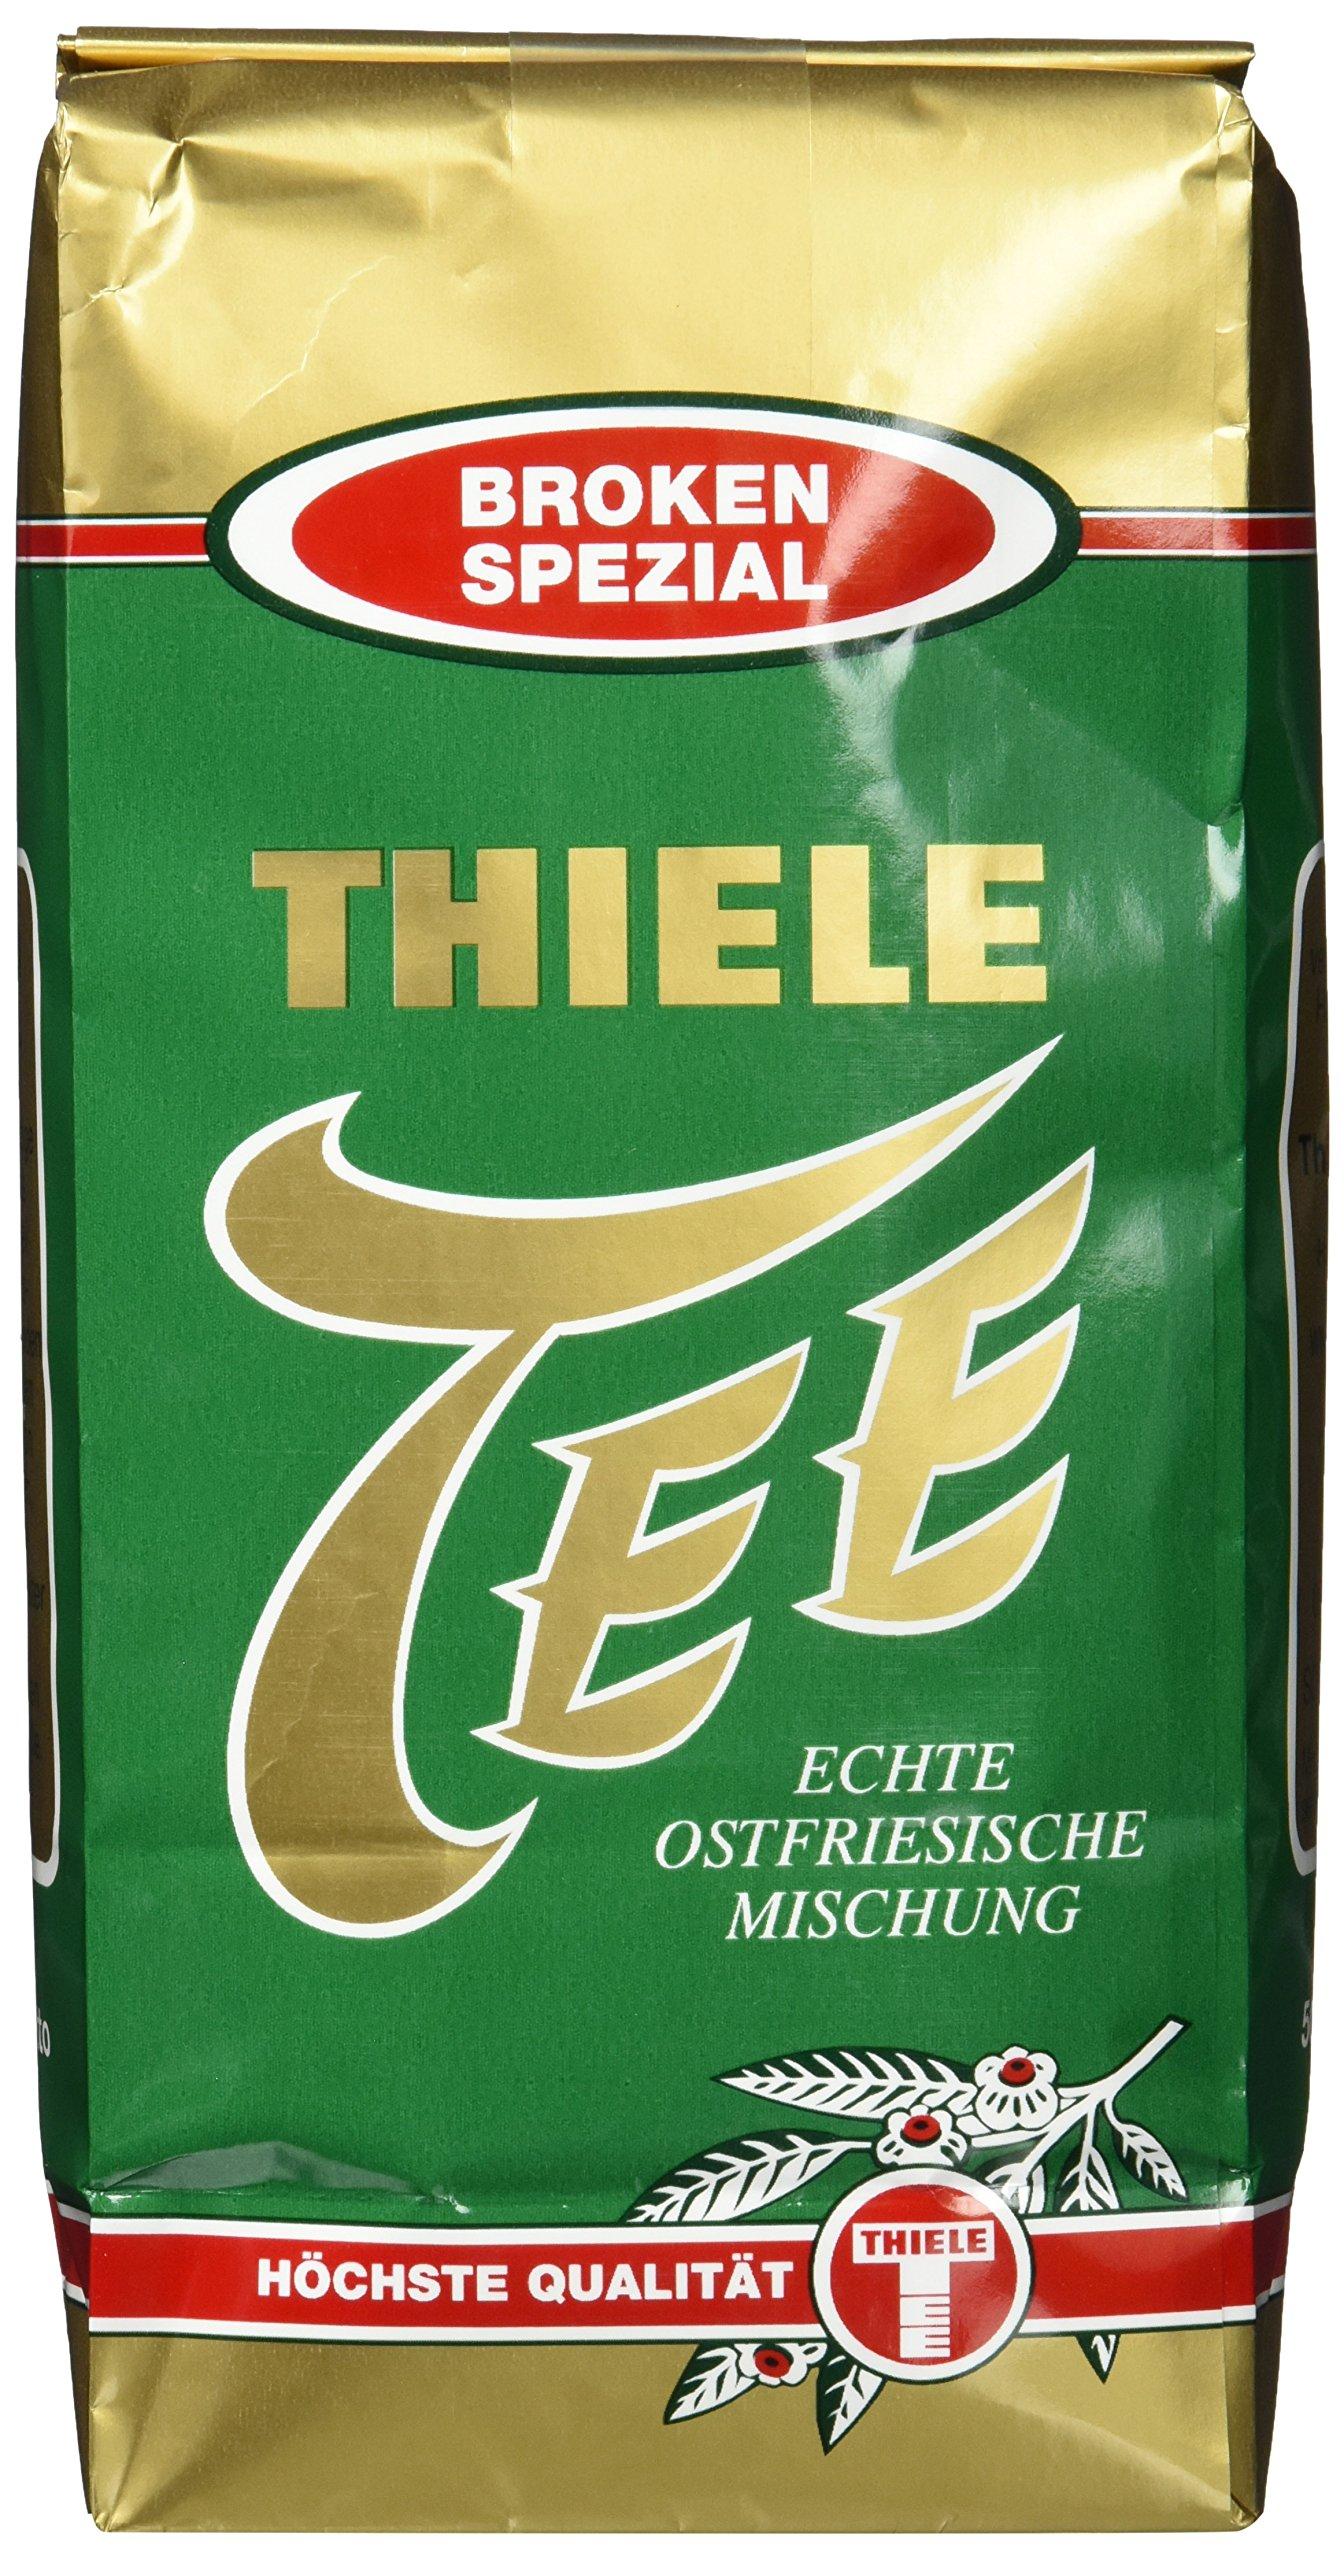 Thiele-Tee-Broken-Spezial-2er-Pack-2-x-500-g